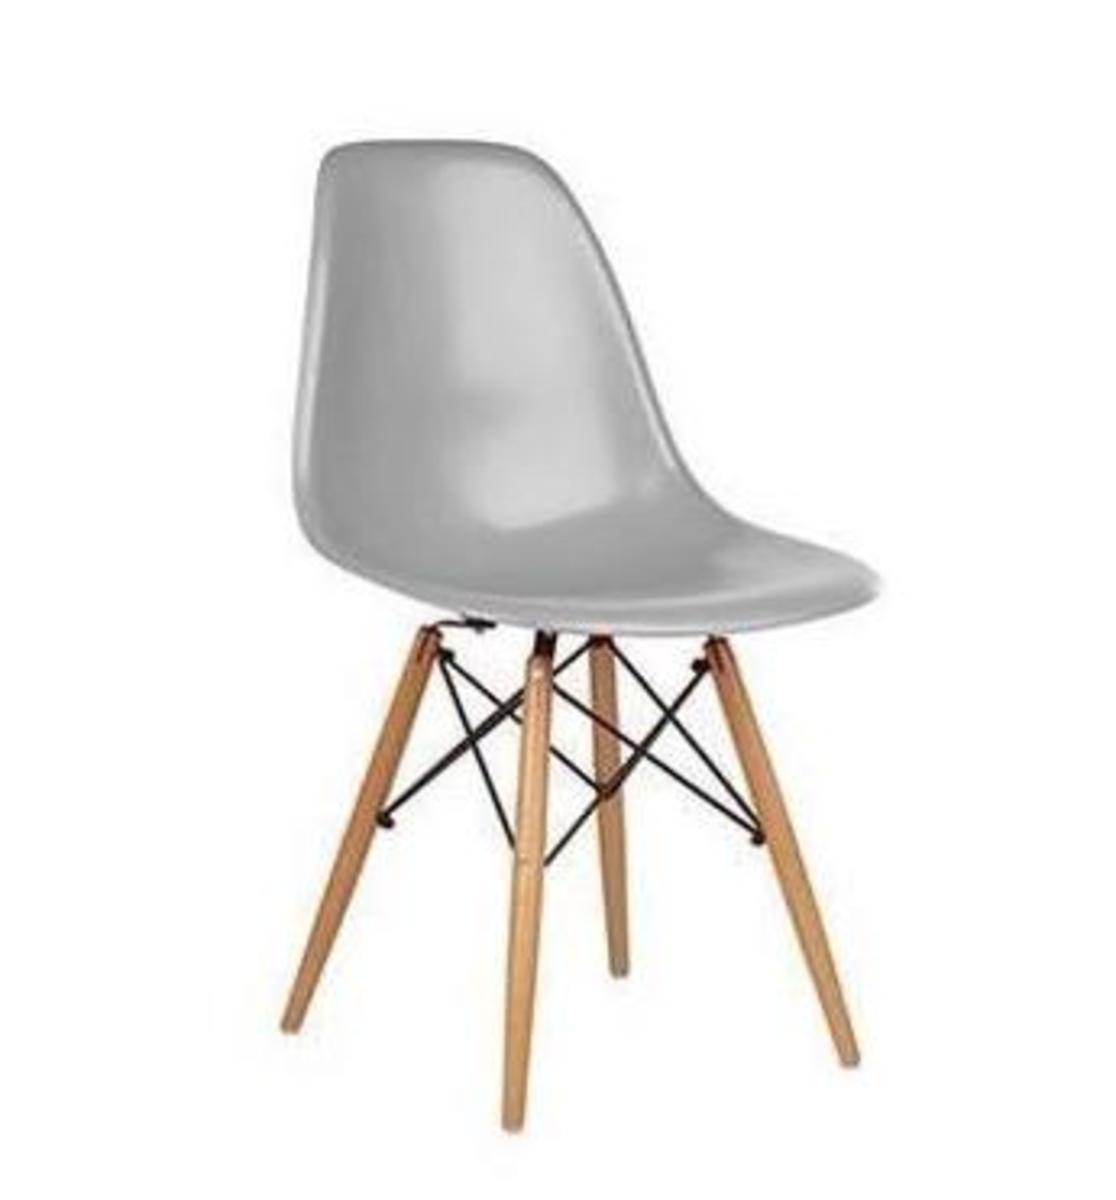 LH116 型格實木腳餐椅  (灰色)